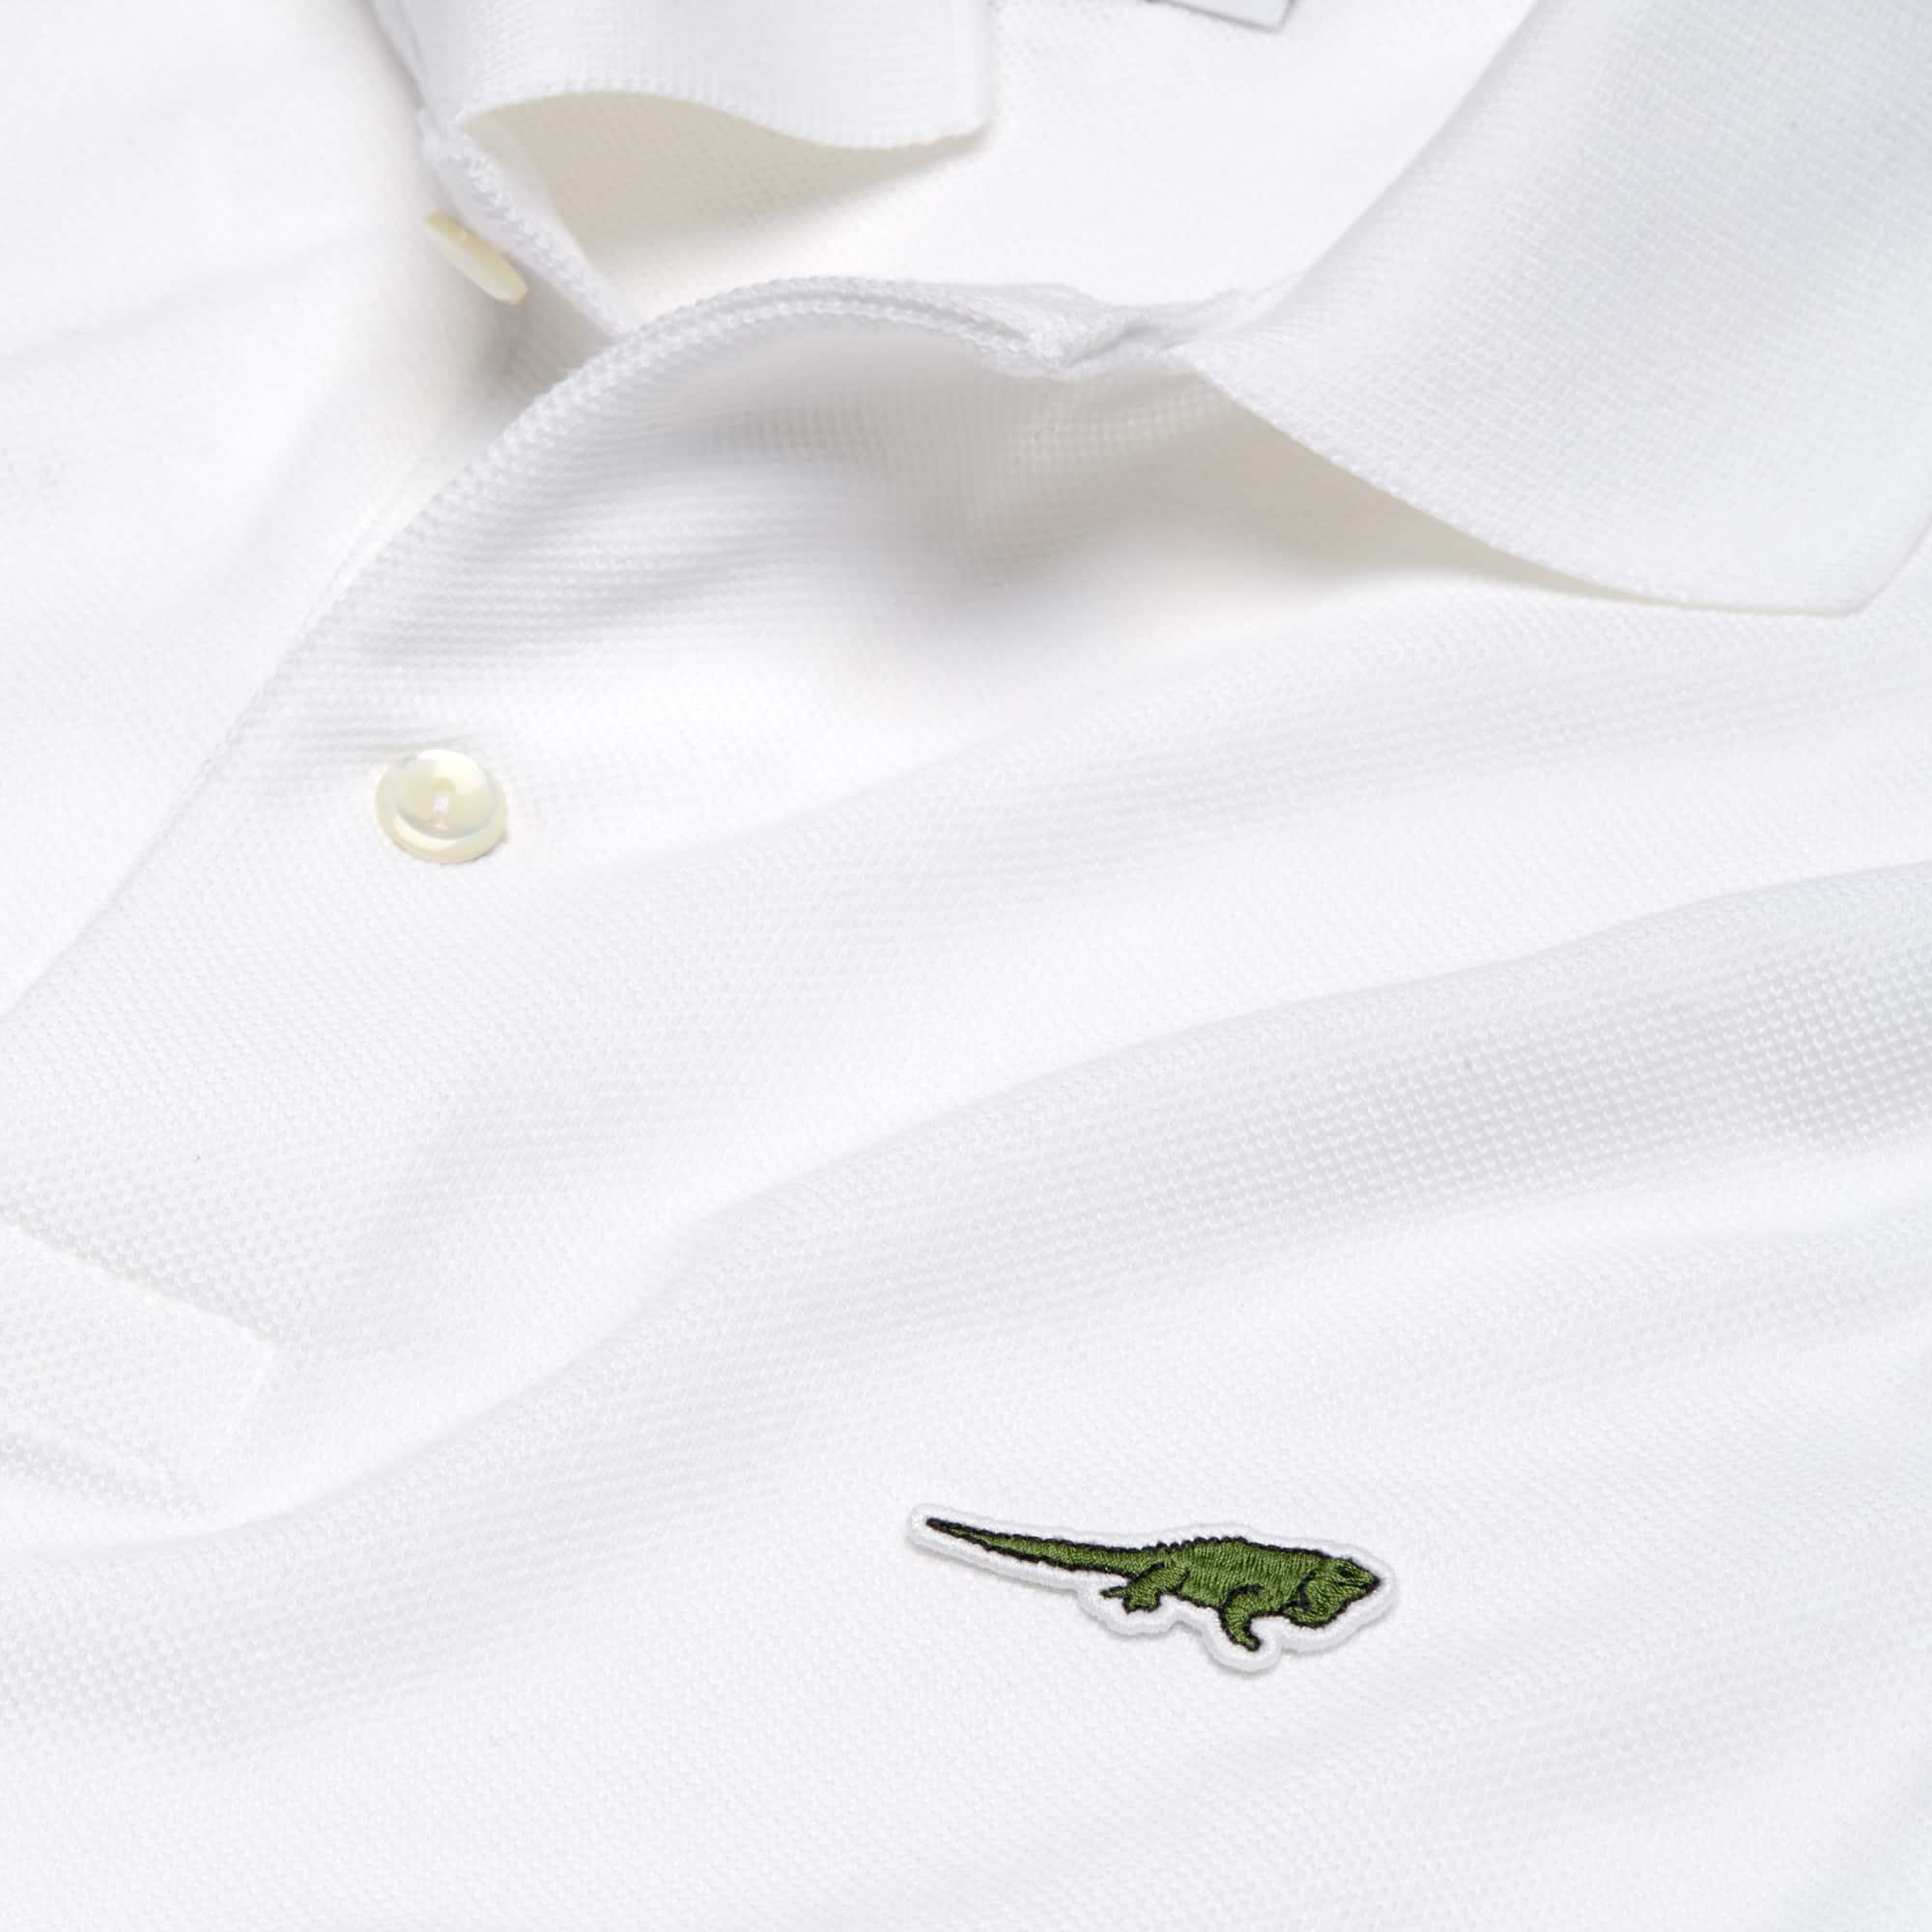 Polo Shirt Lacoste The Anegada Ground Iguana